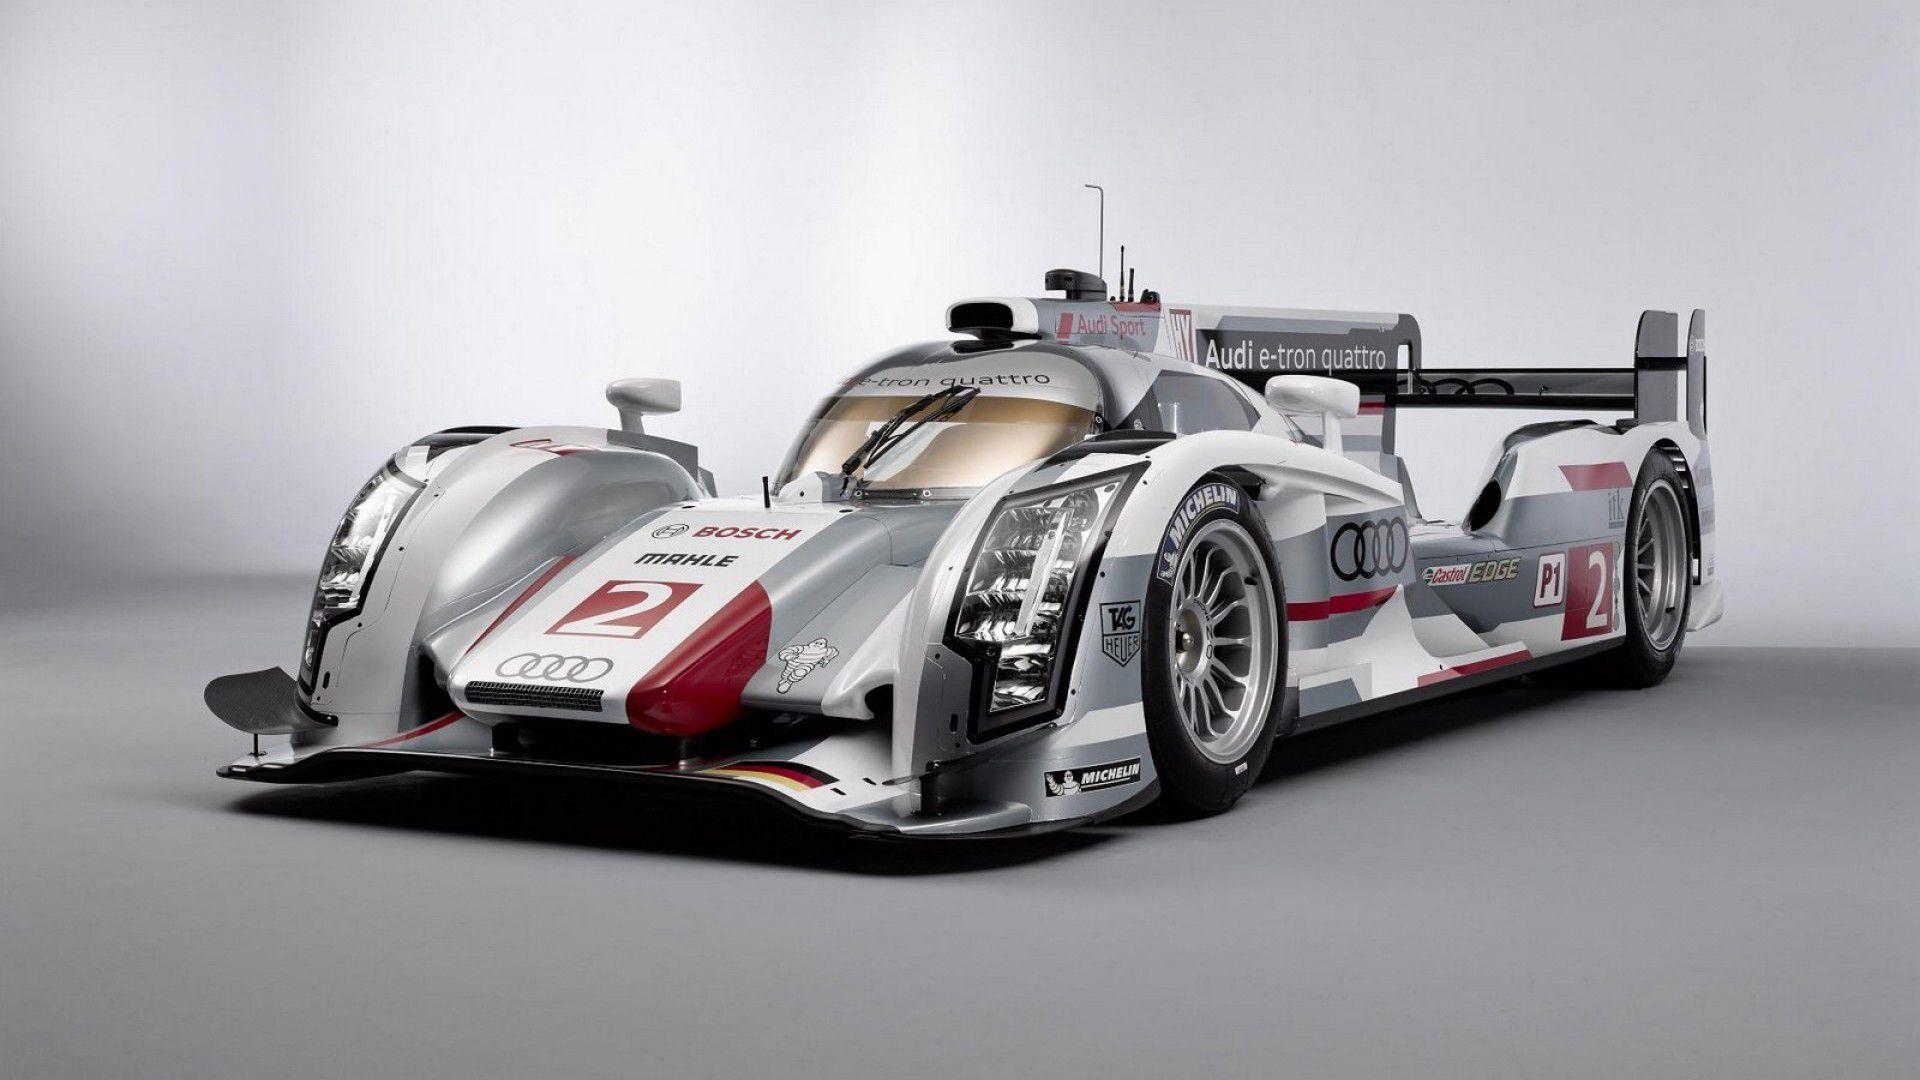 Audi R18 TDI (Le Mans Prototype)